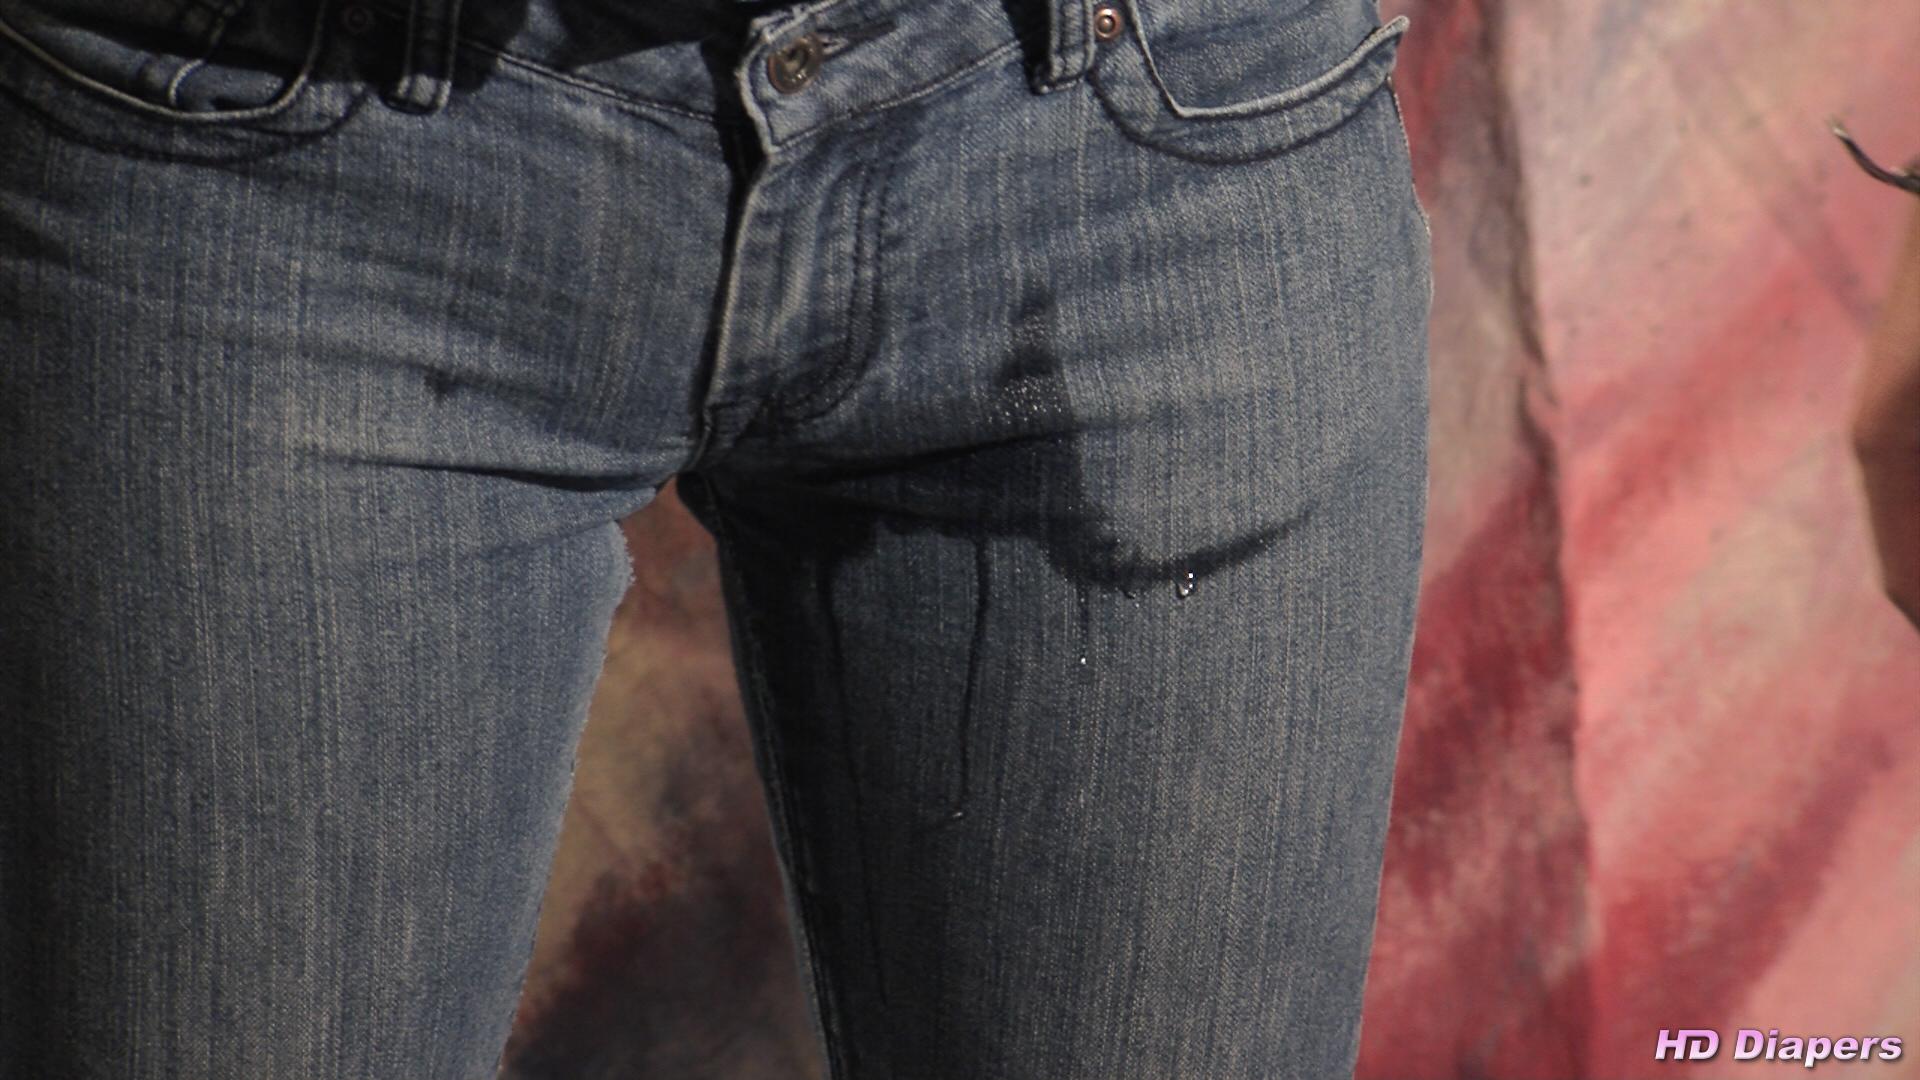 Peeing contest winner gets spa